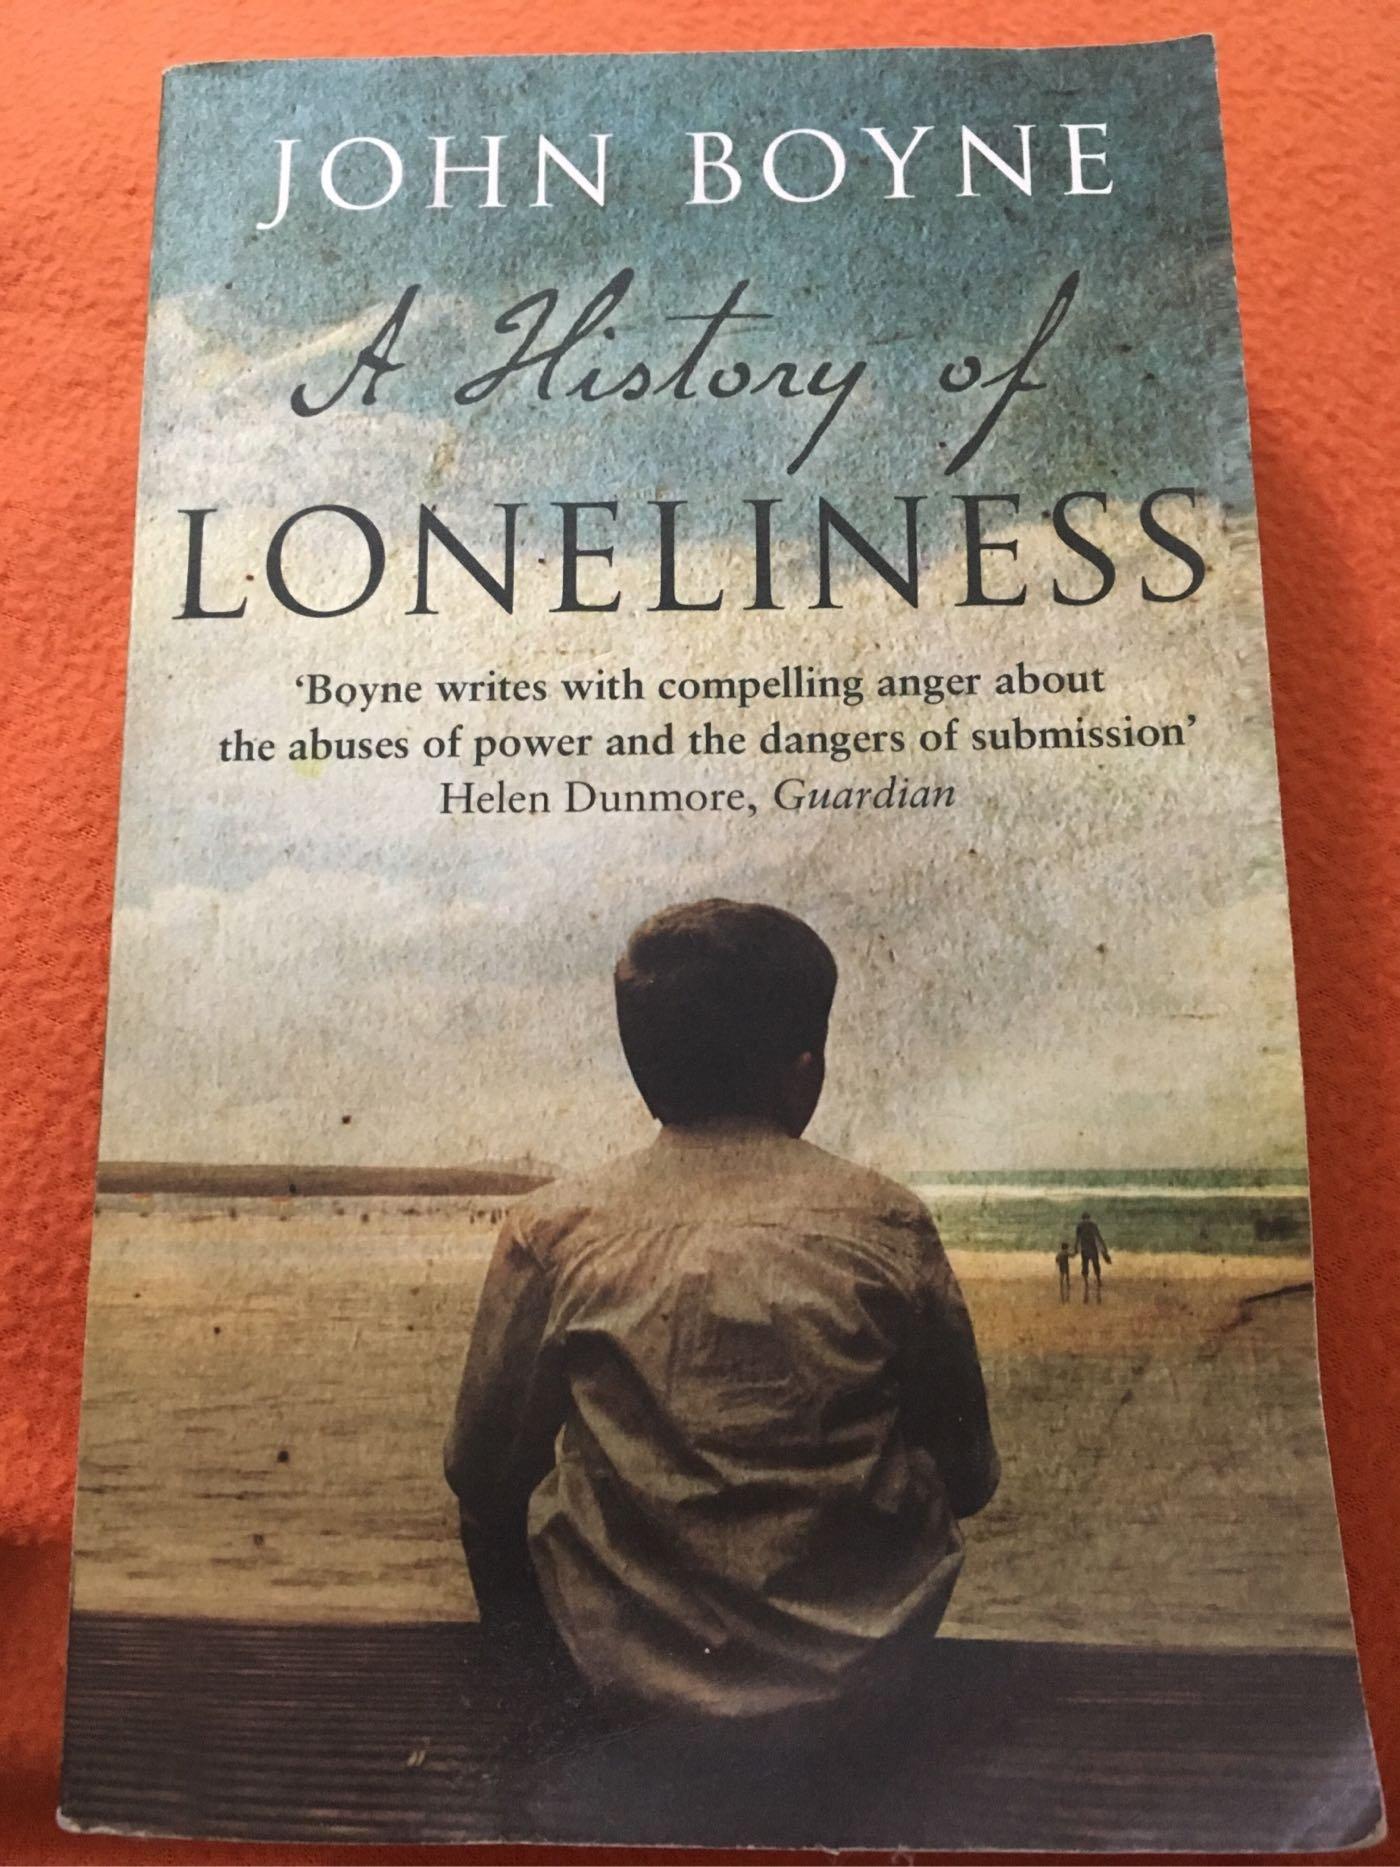 A history of loneliness (by John Boyne)